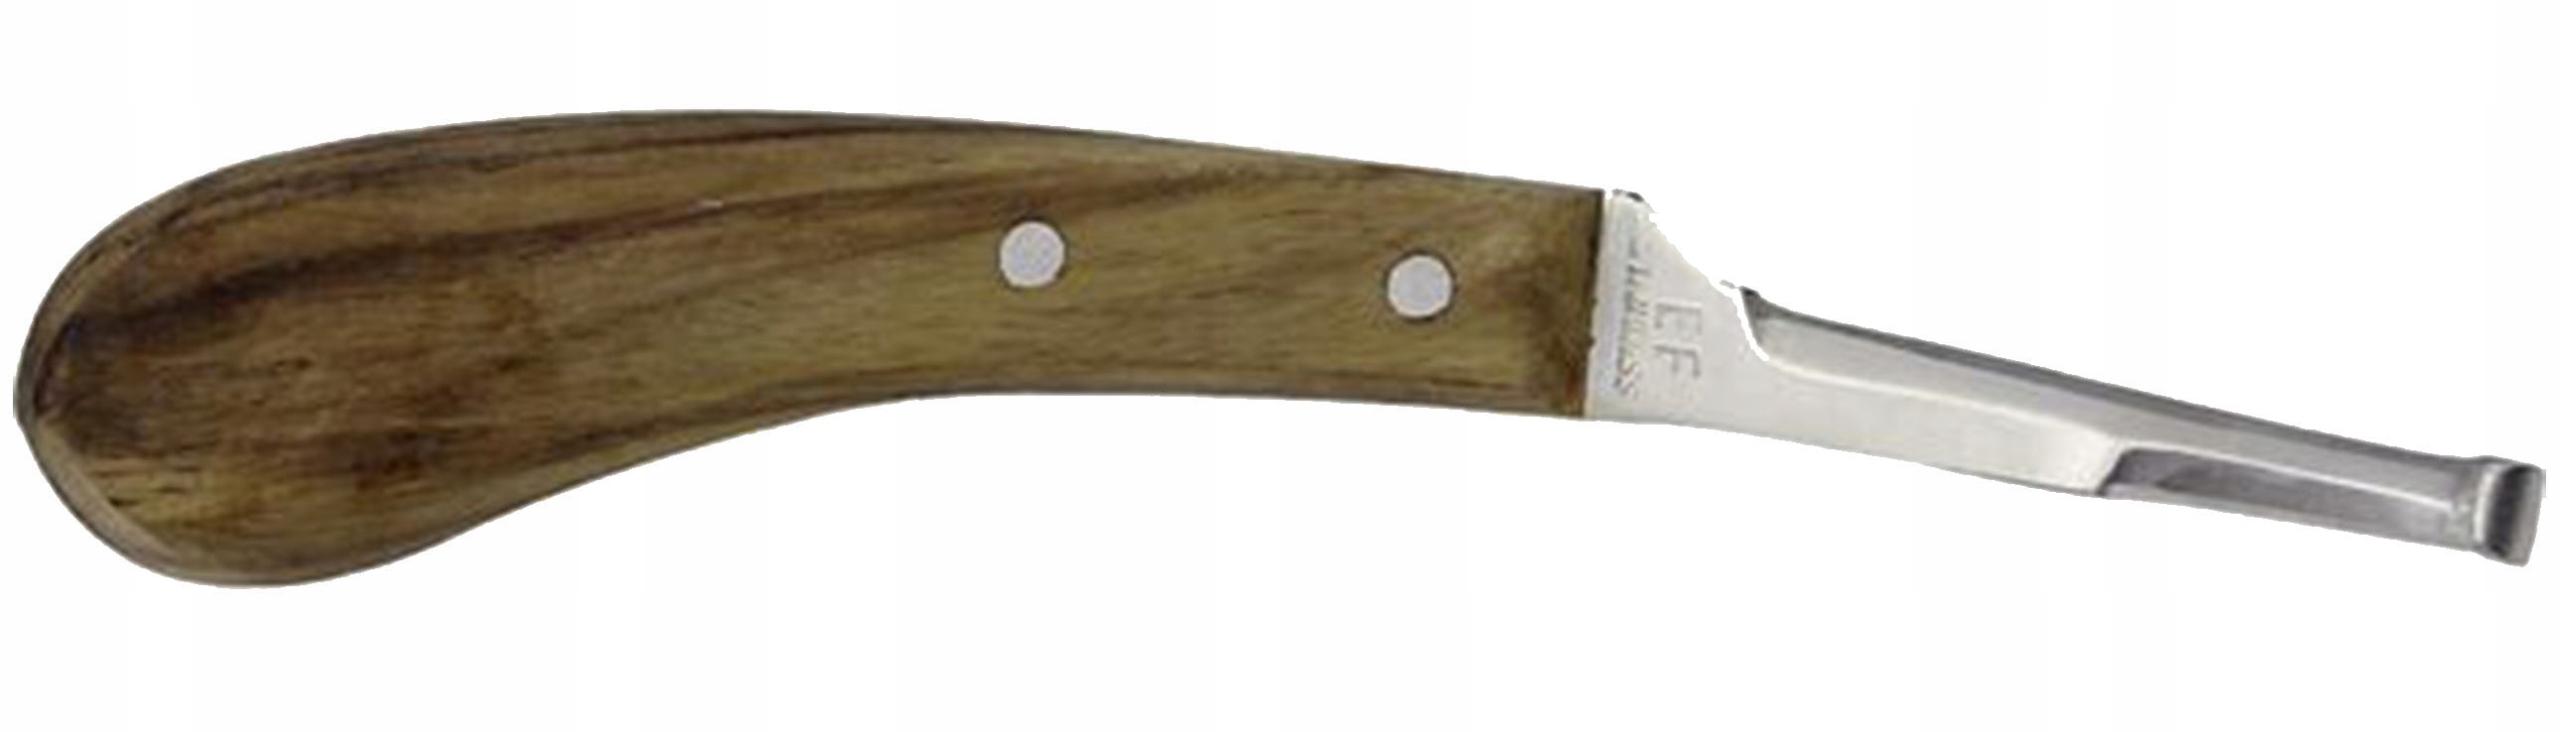 Нож для коррекции двусторонних копыт